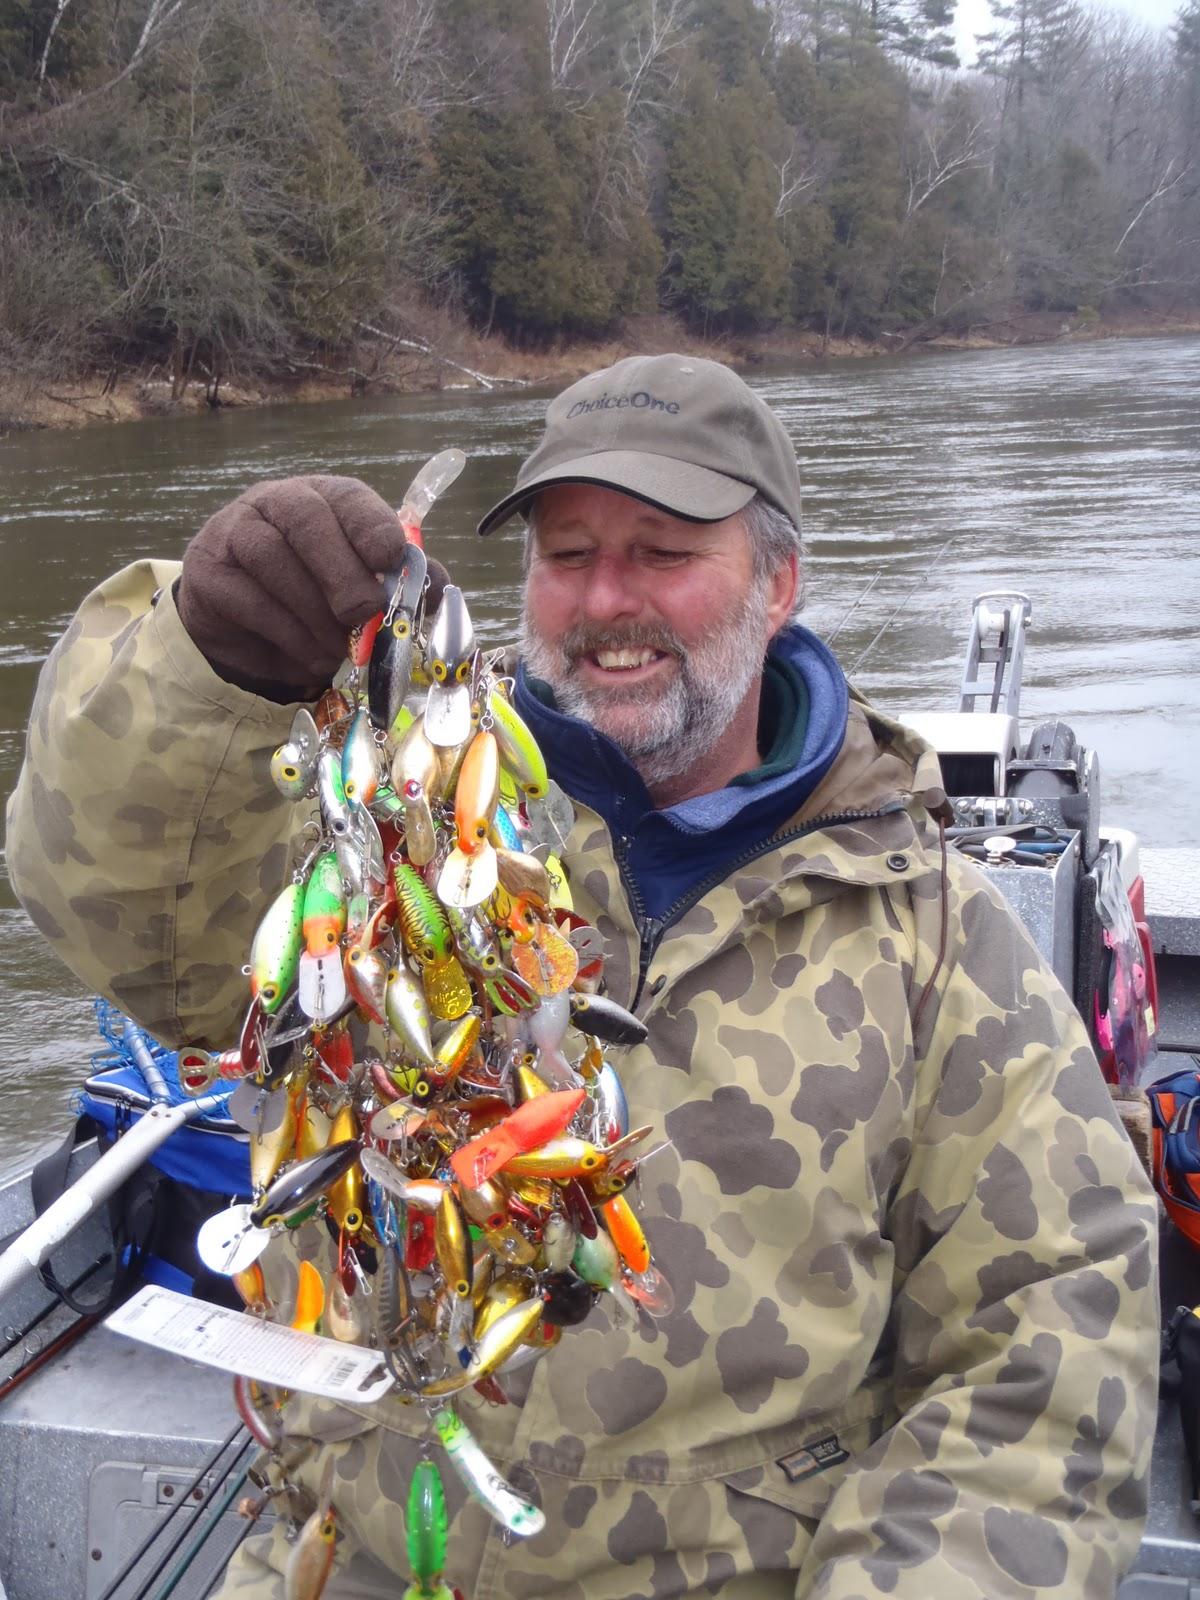 Art by sherri russell associates fishing lure frenzie for Steelhead fishing lures